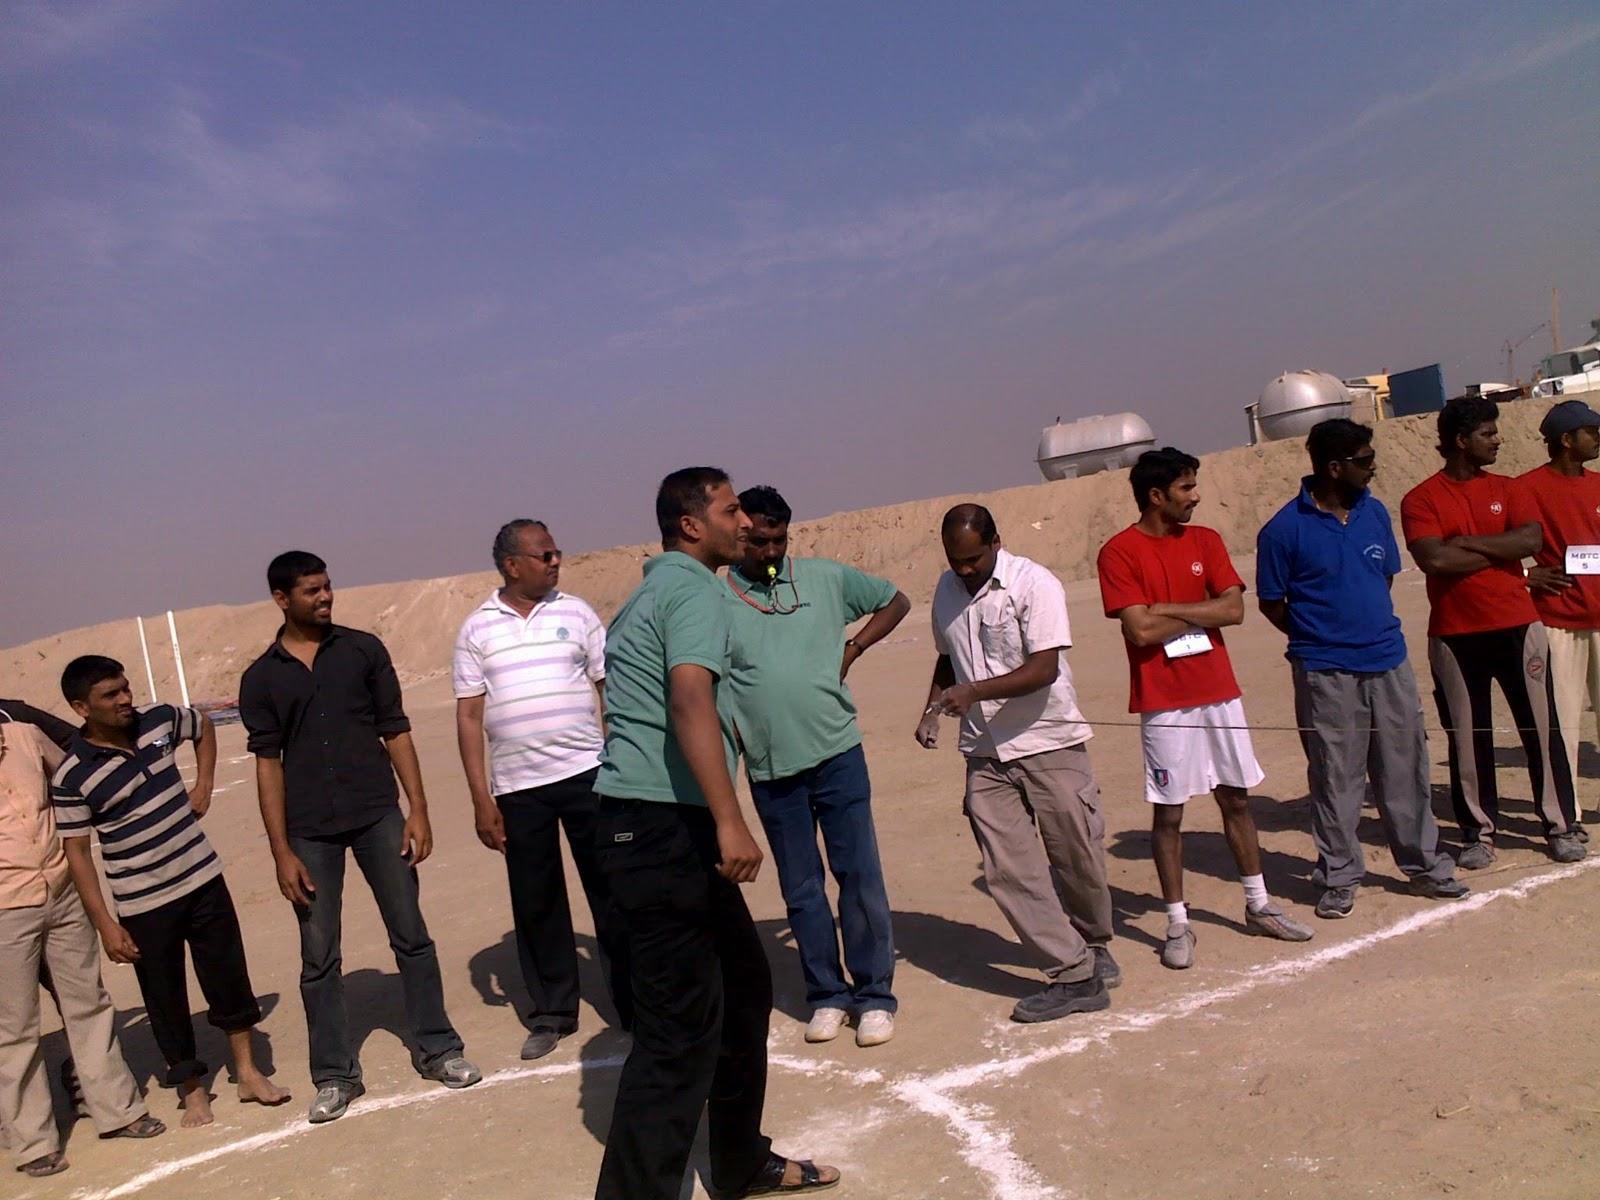 NBTC - Technical Services Div : Annual Sports Meet - 2009 in NBTC Kuwait